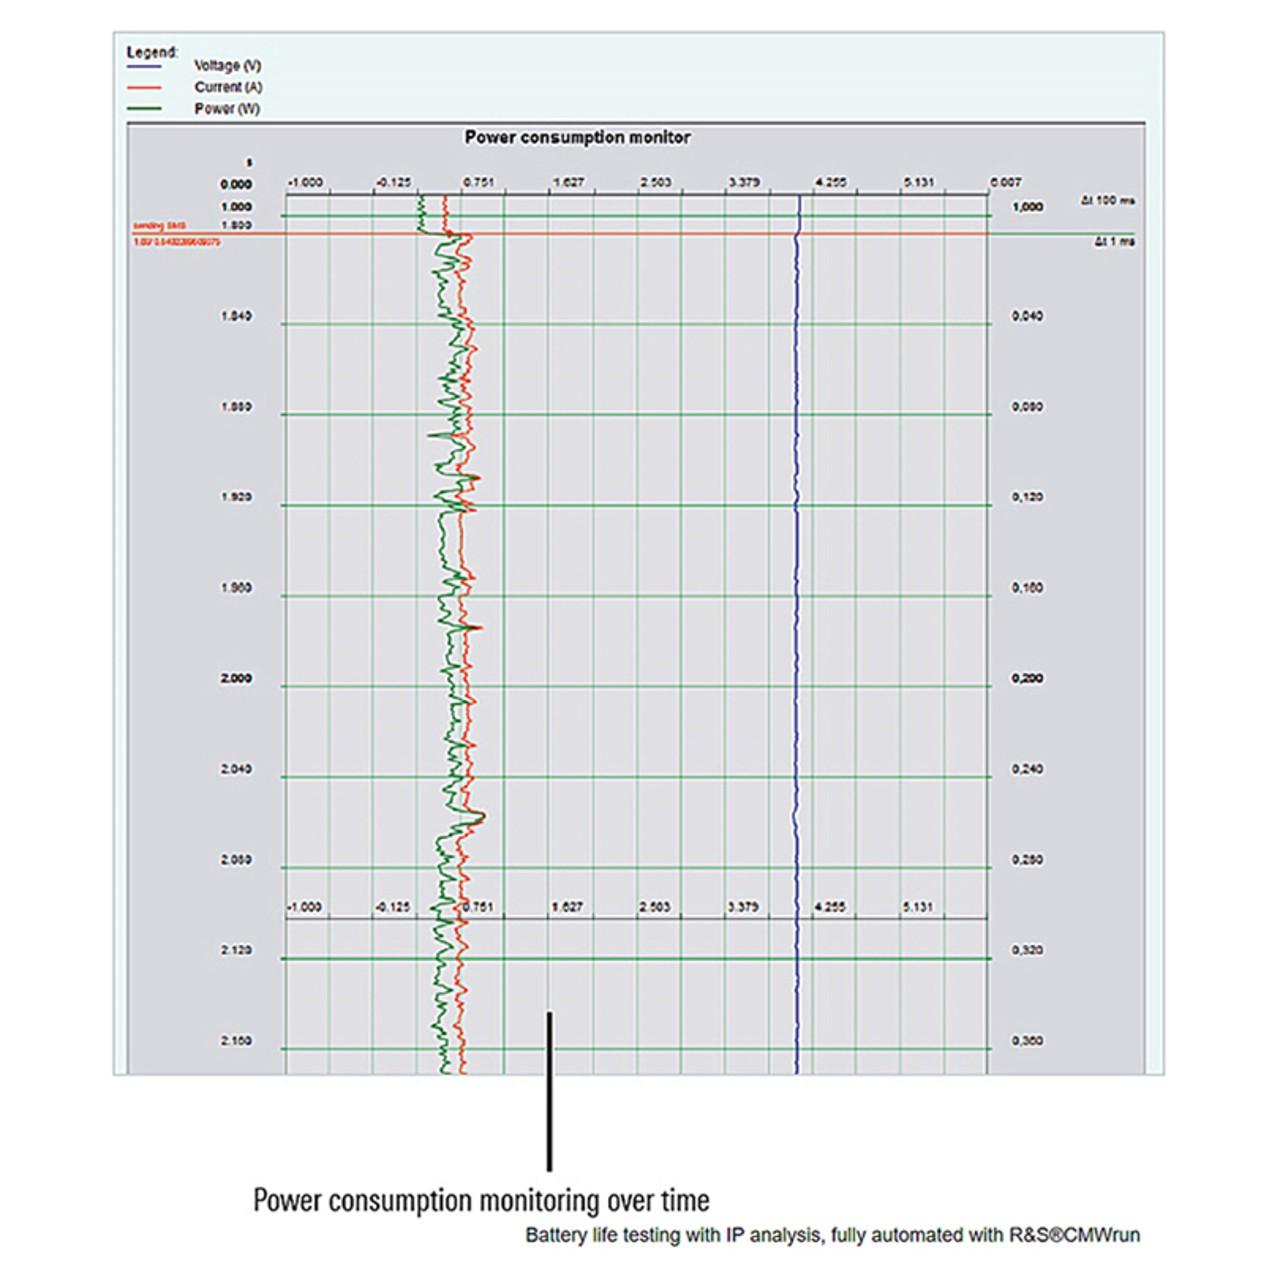 cmwrun-battery-life-measurements_ac_01_810x.jpg